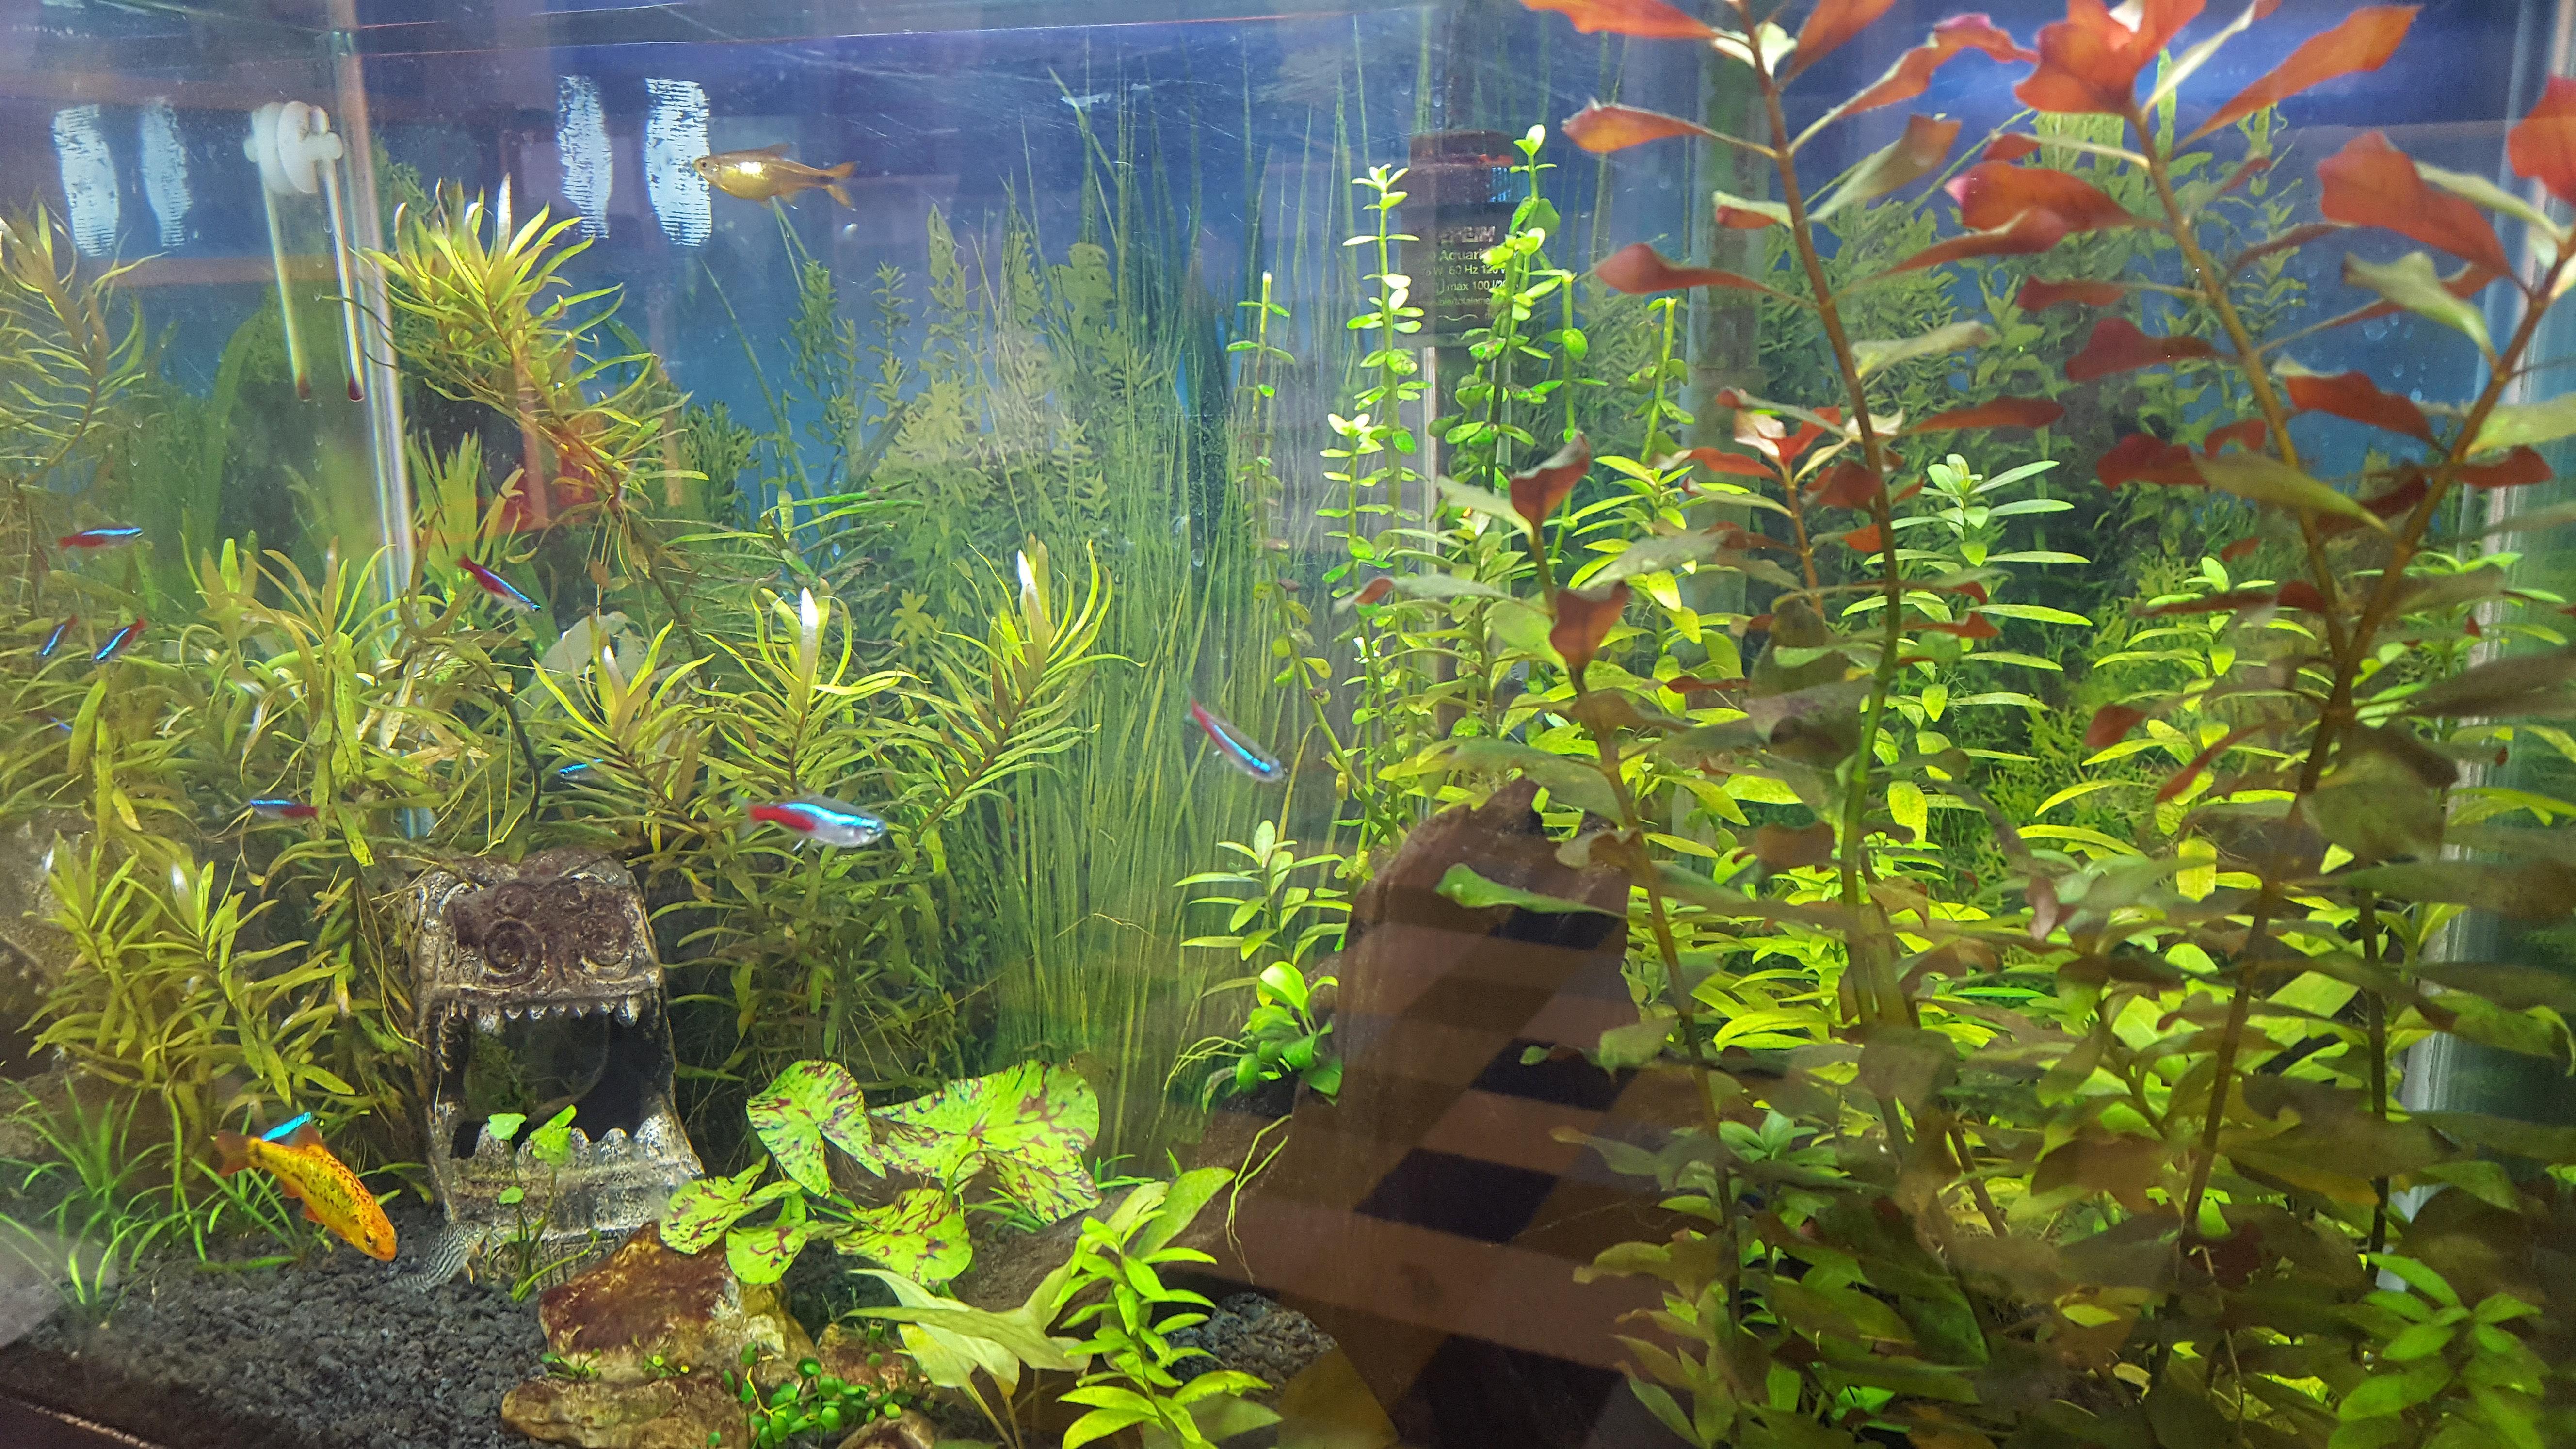 Fish aquarium edmonton - Westmount Discovery Time Preschool Edmonton Our Fish